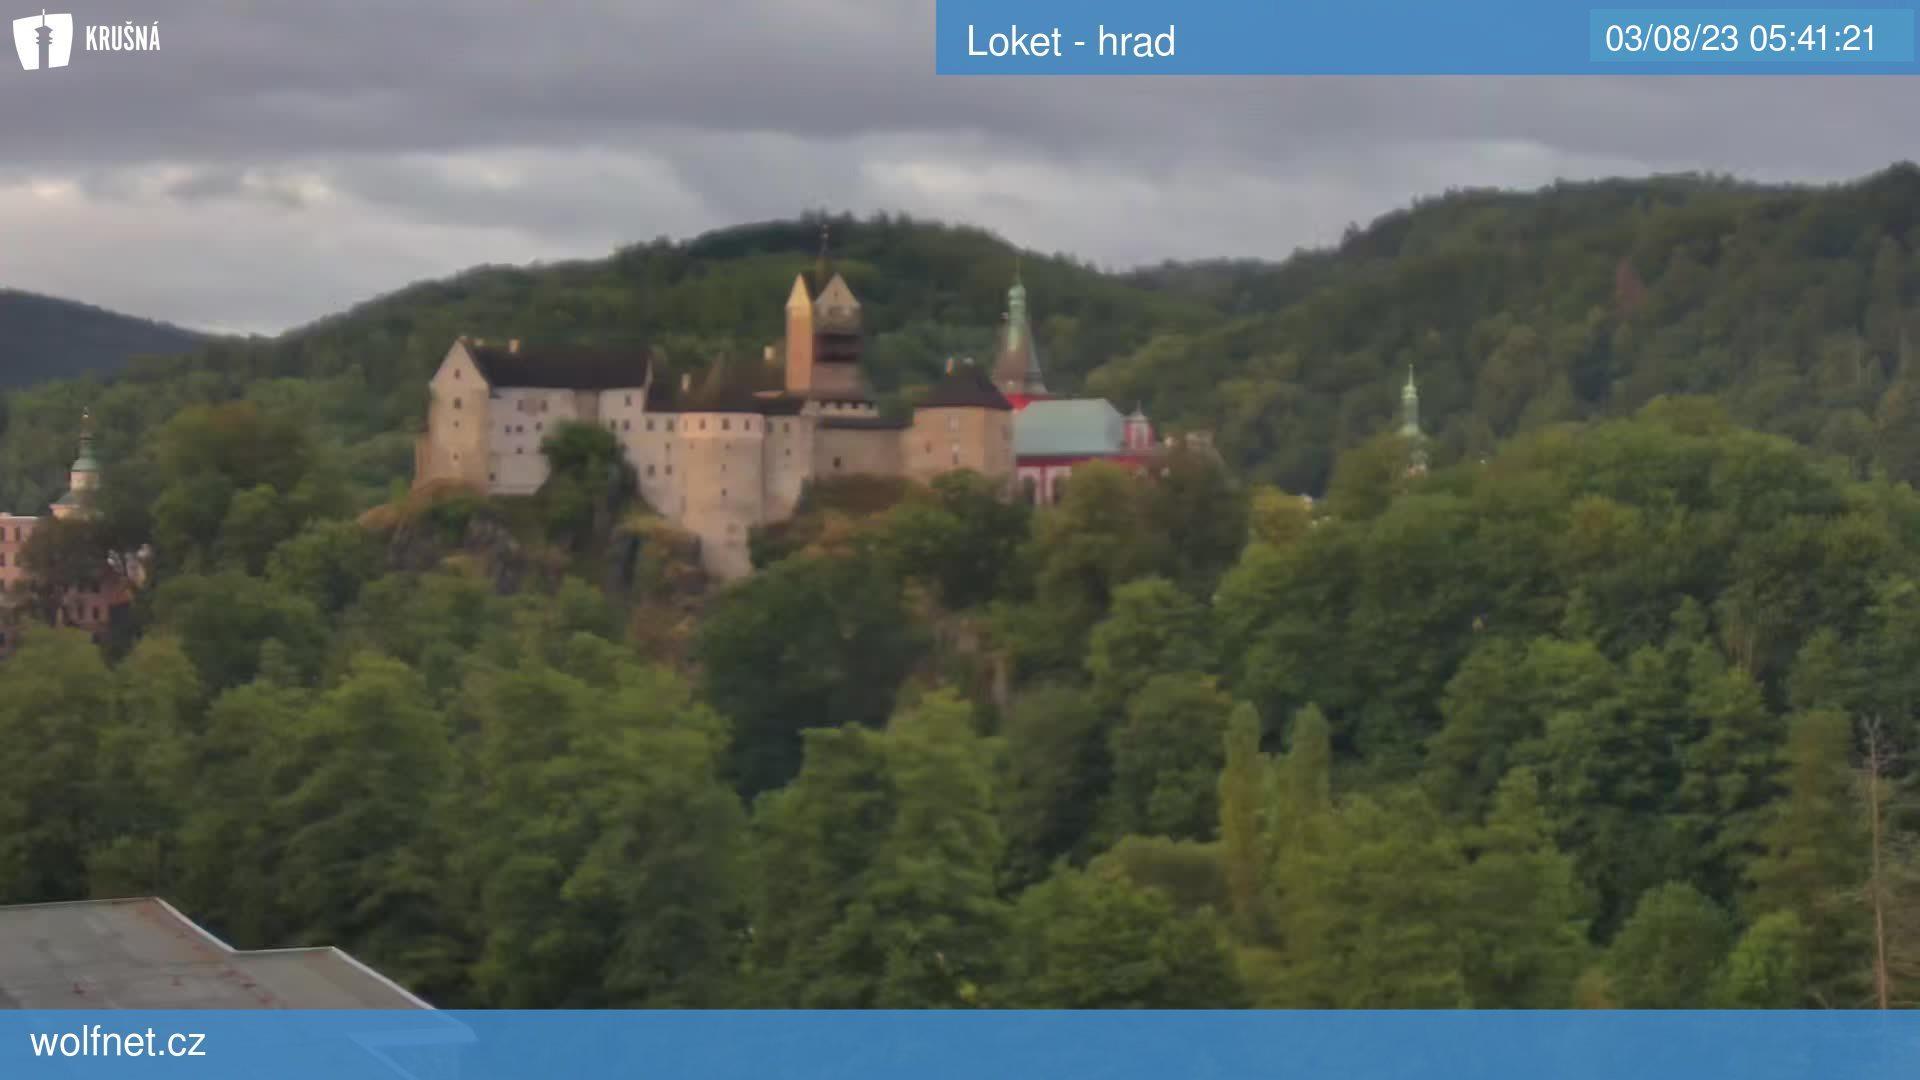 Webkamera Loket - hrad